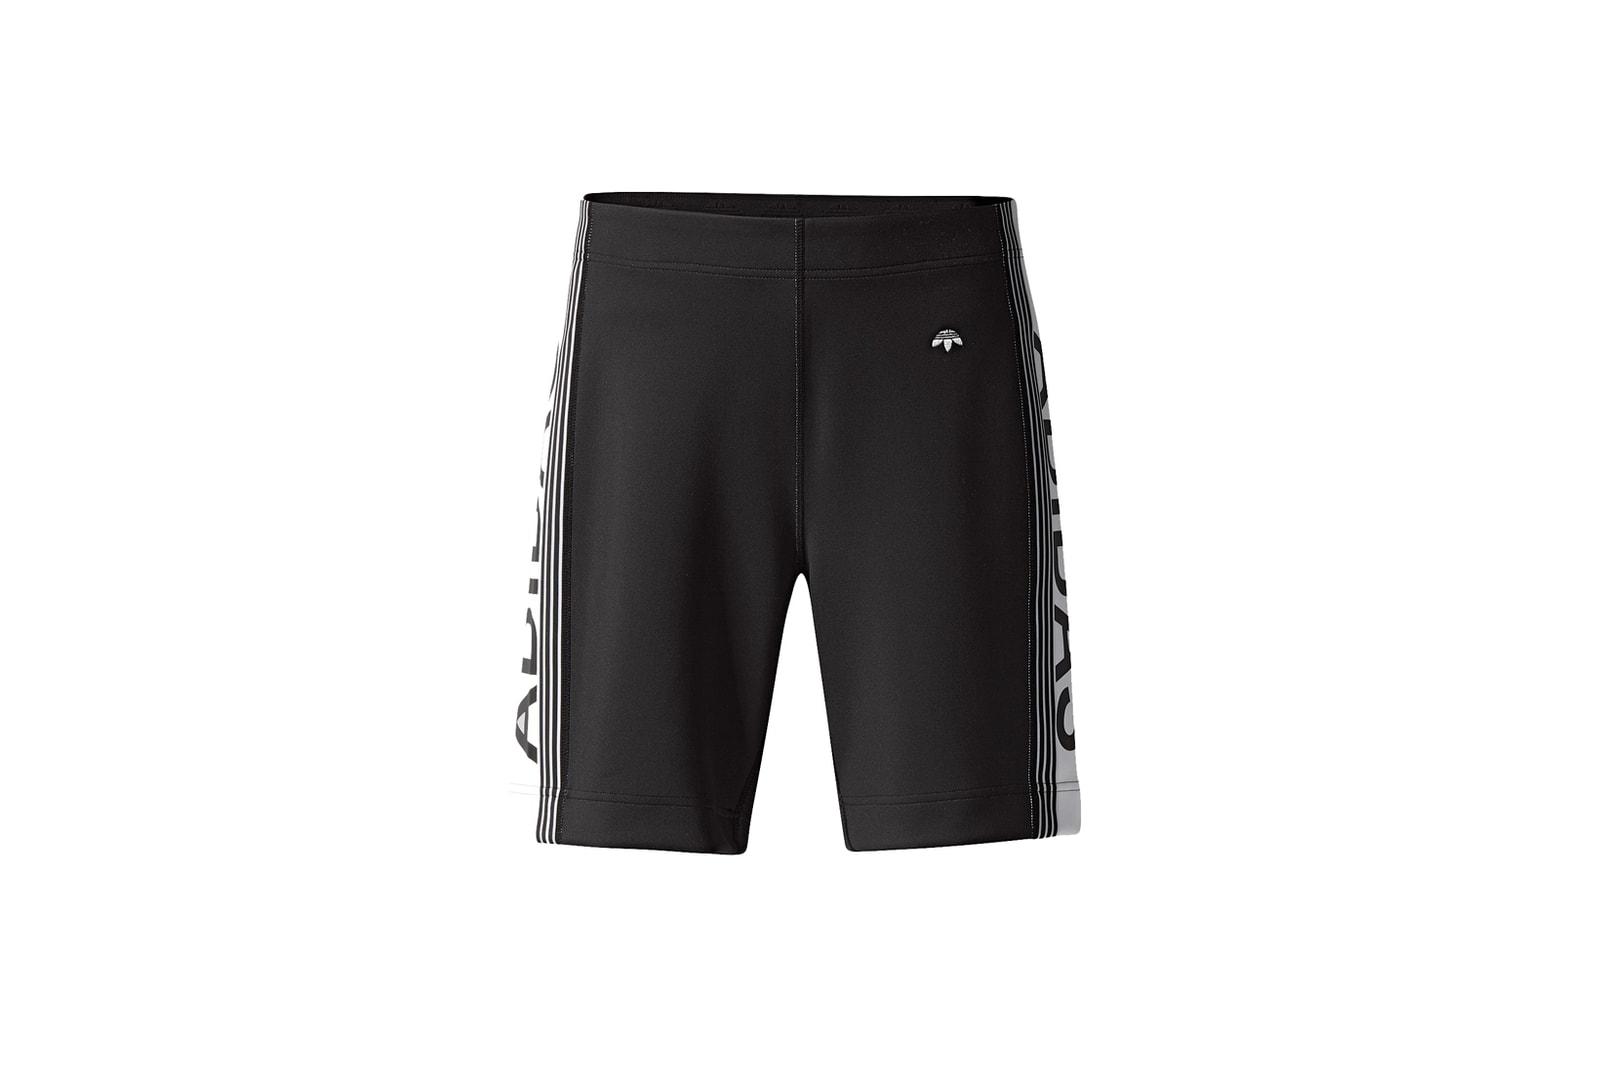 d18c28b7 adidas Originals Alexander Wang Season 2 Drop 1 Bicycle Cycling Rave Neon  Green Black Bike Messenger